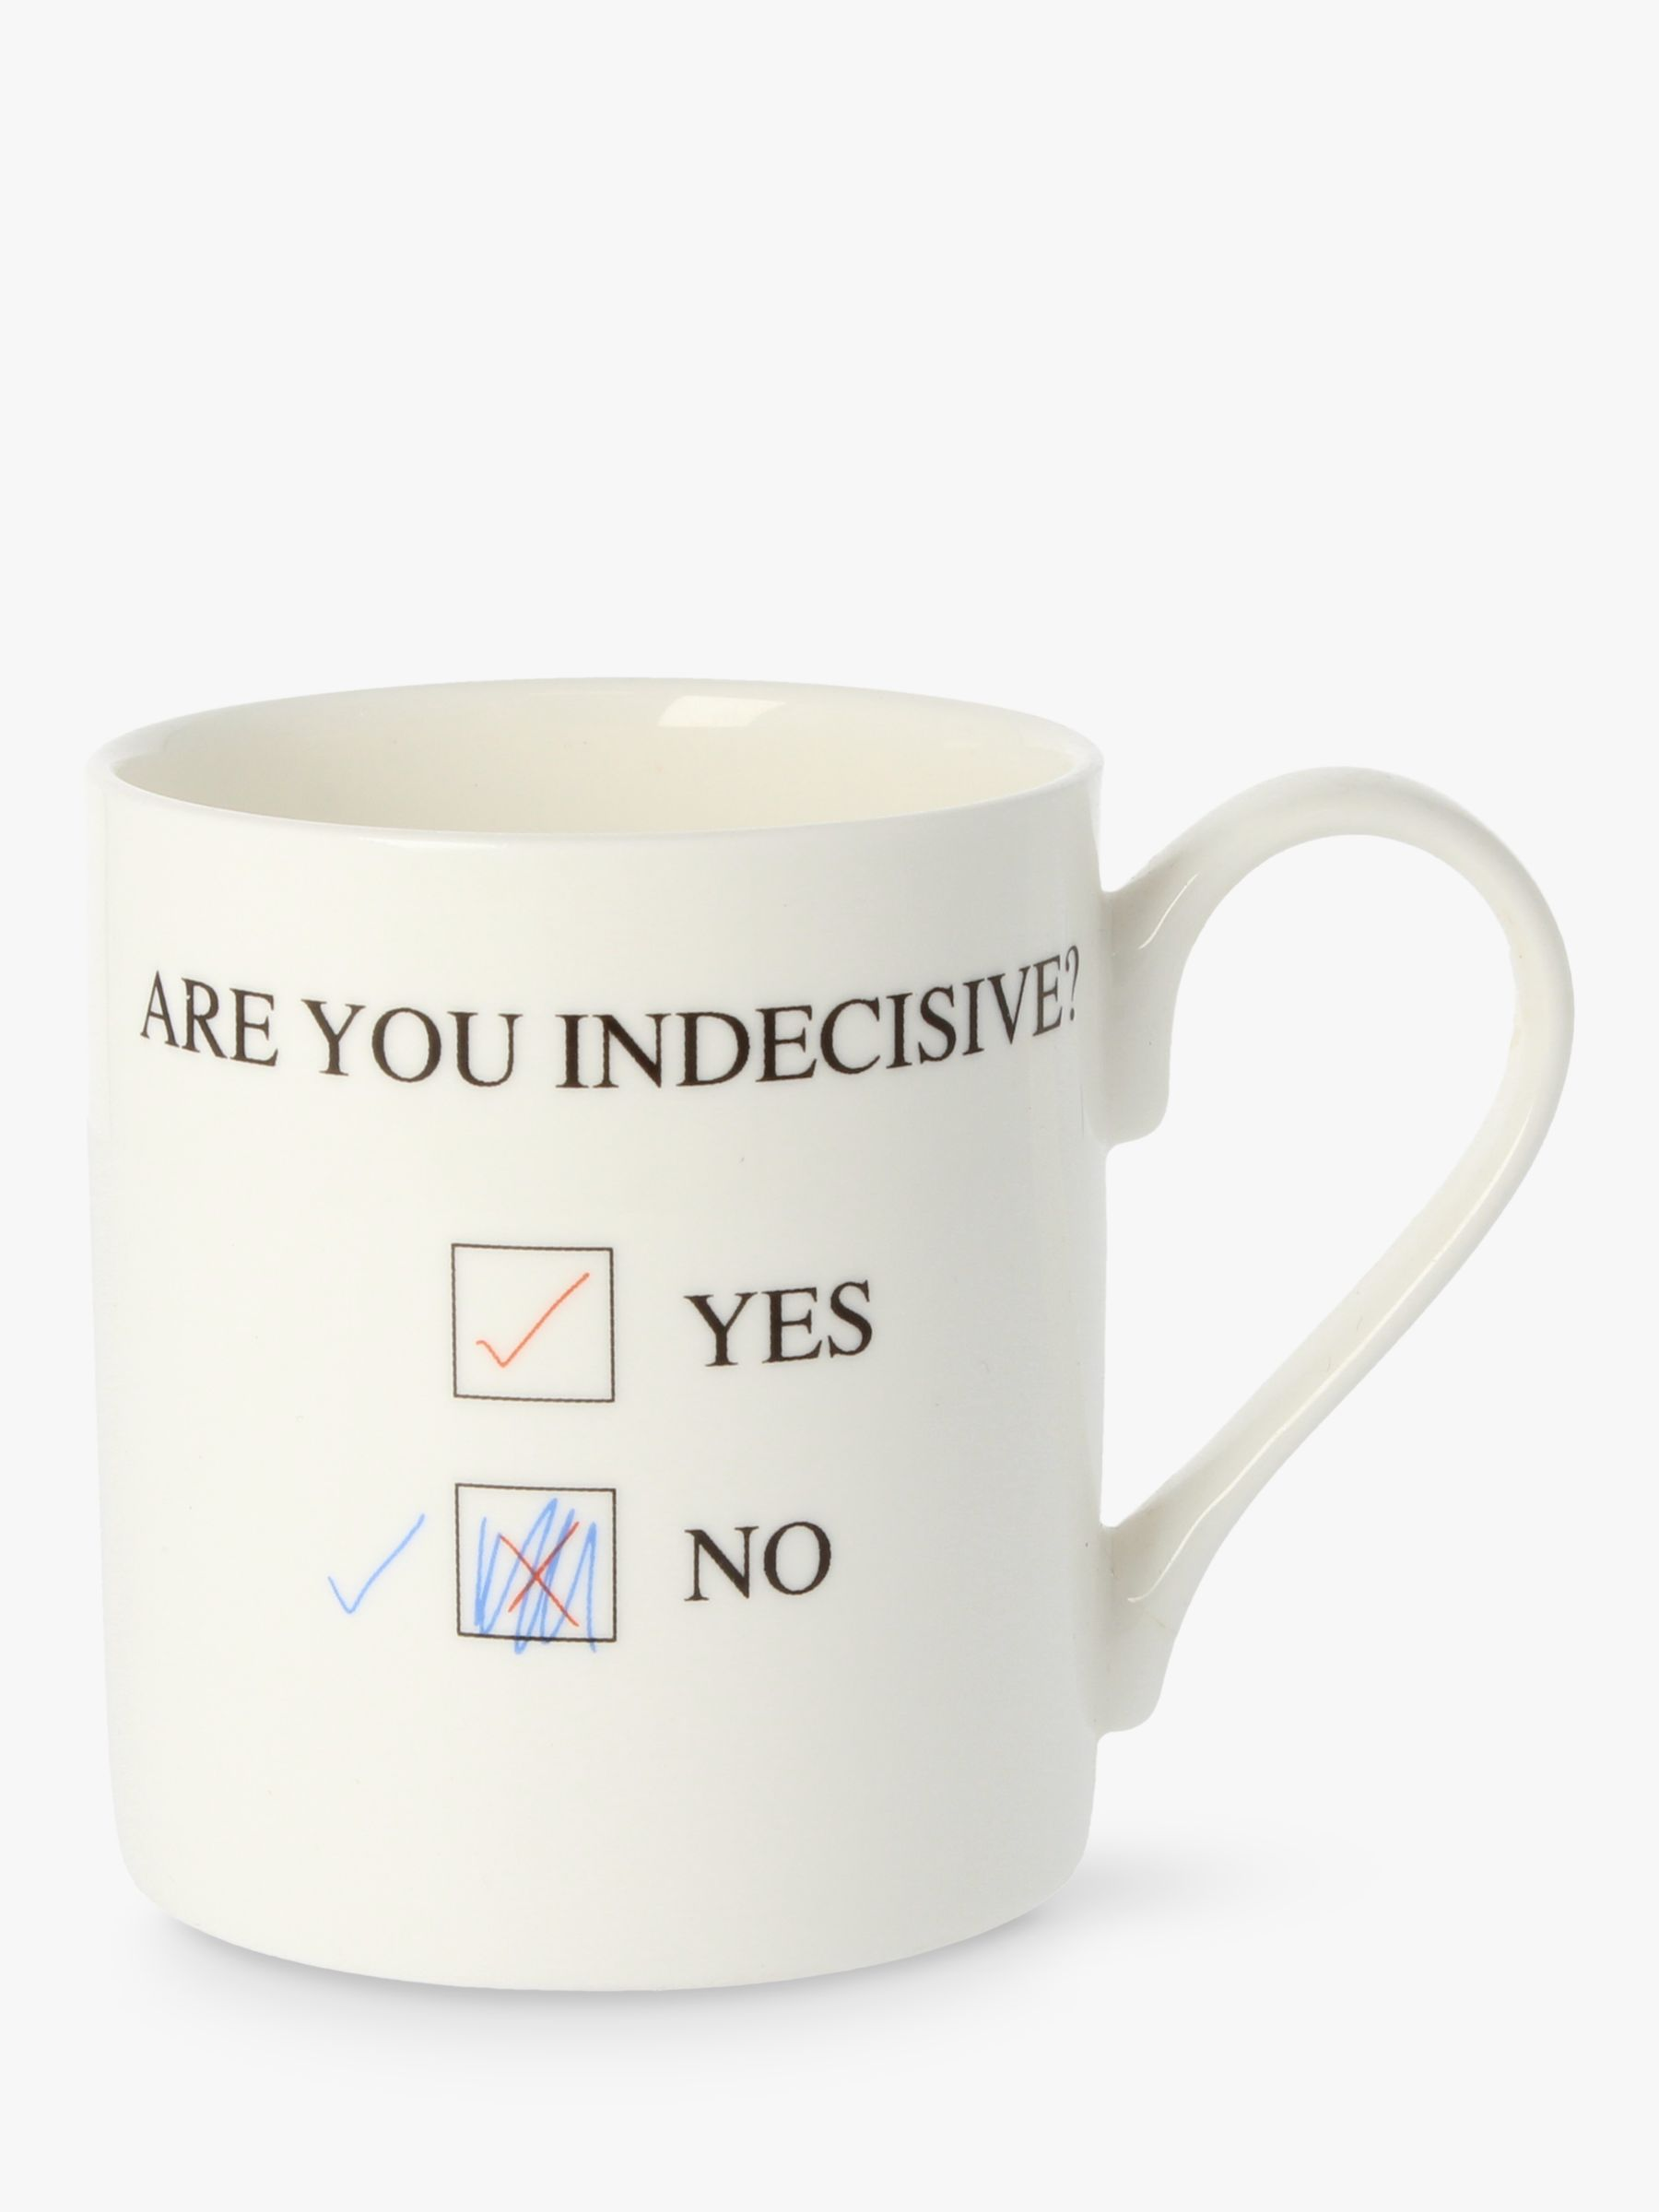 McLaggan Smith McLaggan Smith 'Are You Indecisive' Mug, White/Multi, 350ml